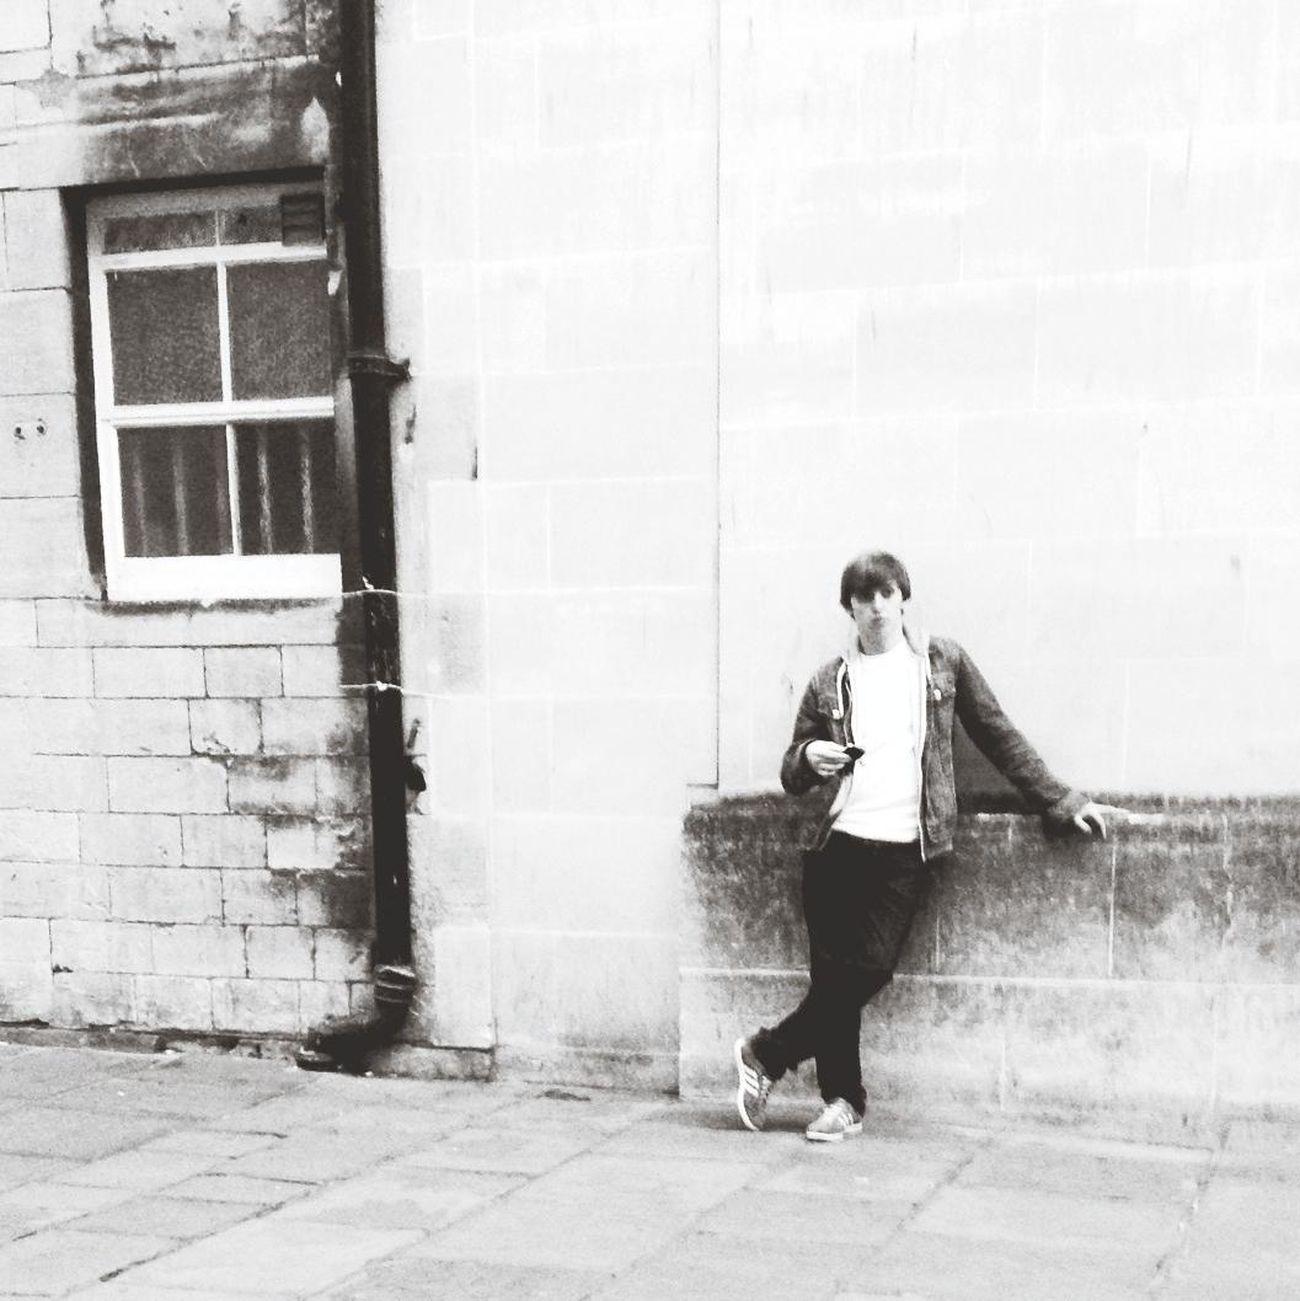 Streetphoto_bw Blackandwhite Bathcity Capa Filter